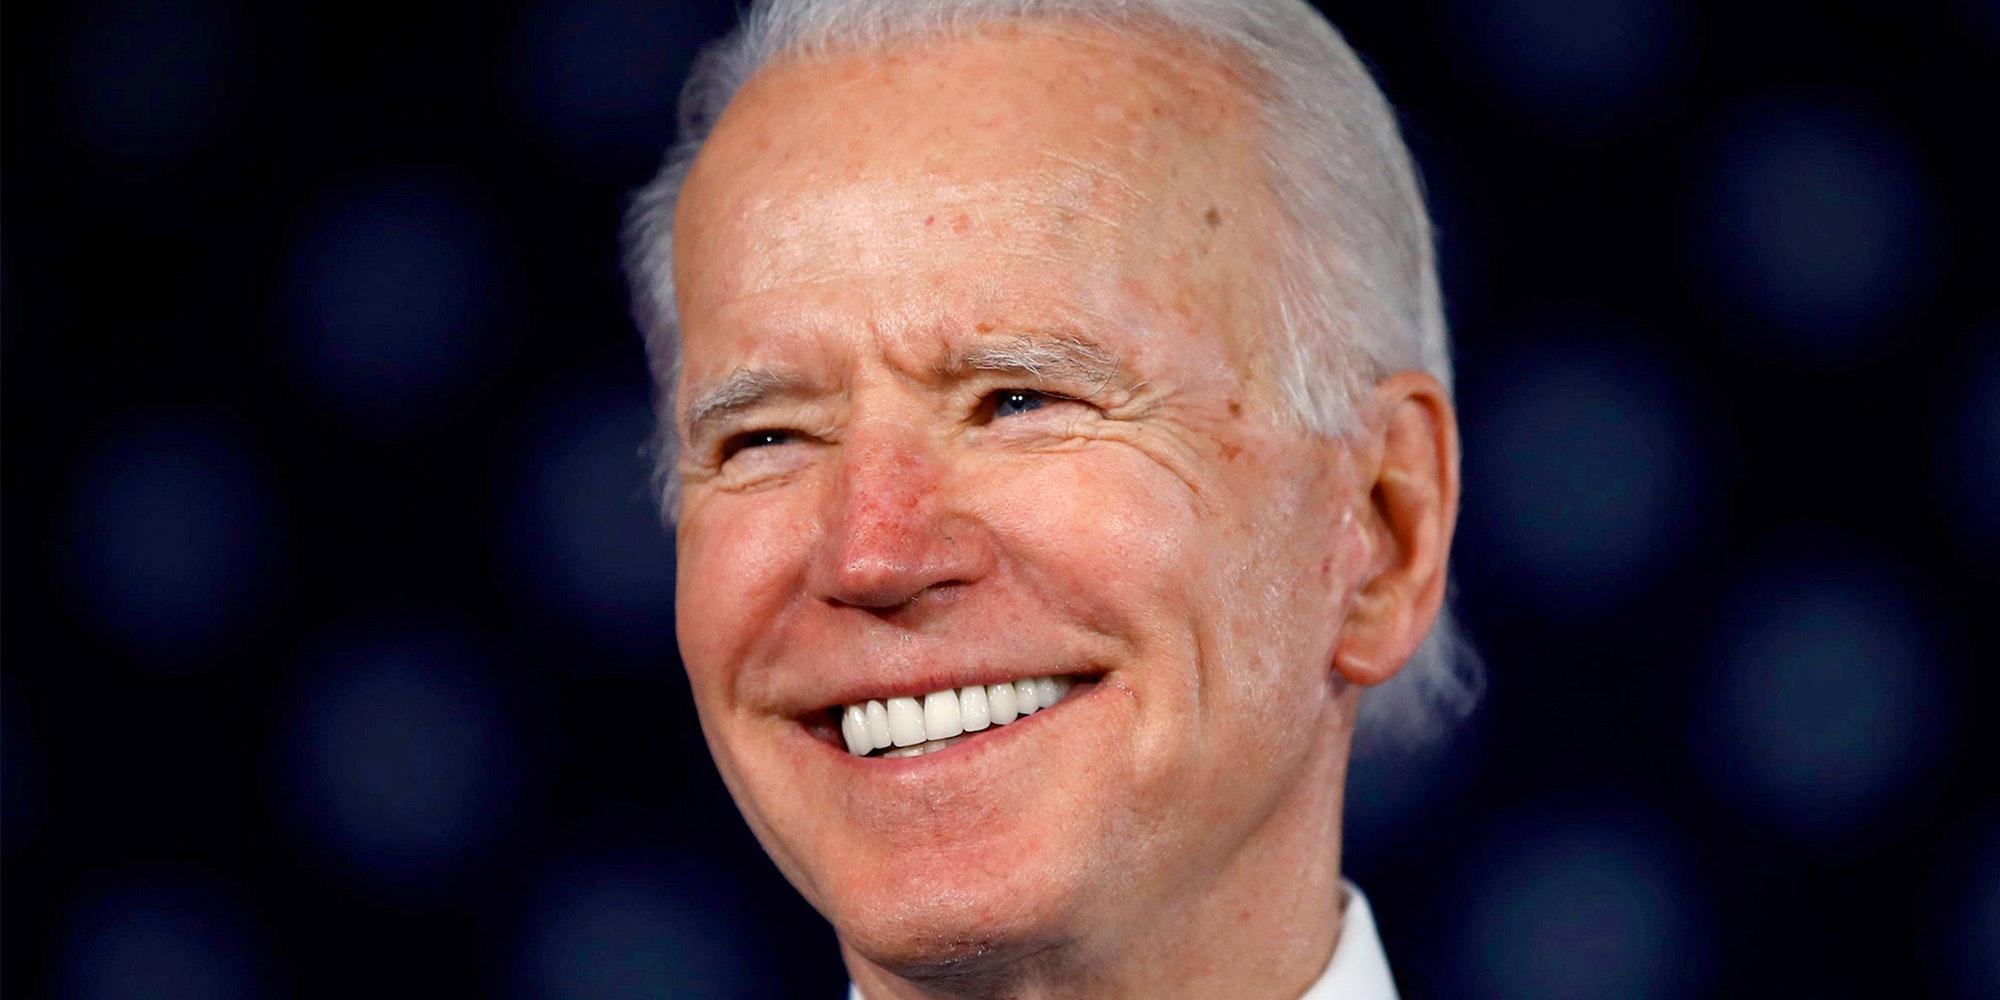 U.S. President Joe Biden smiling